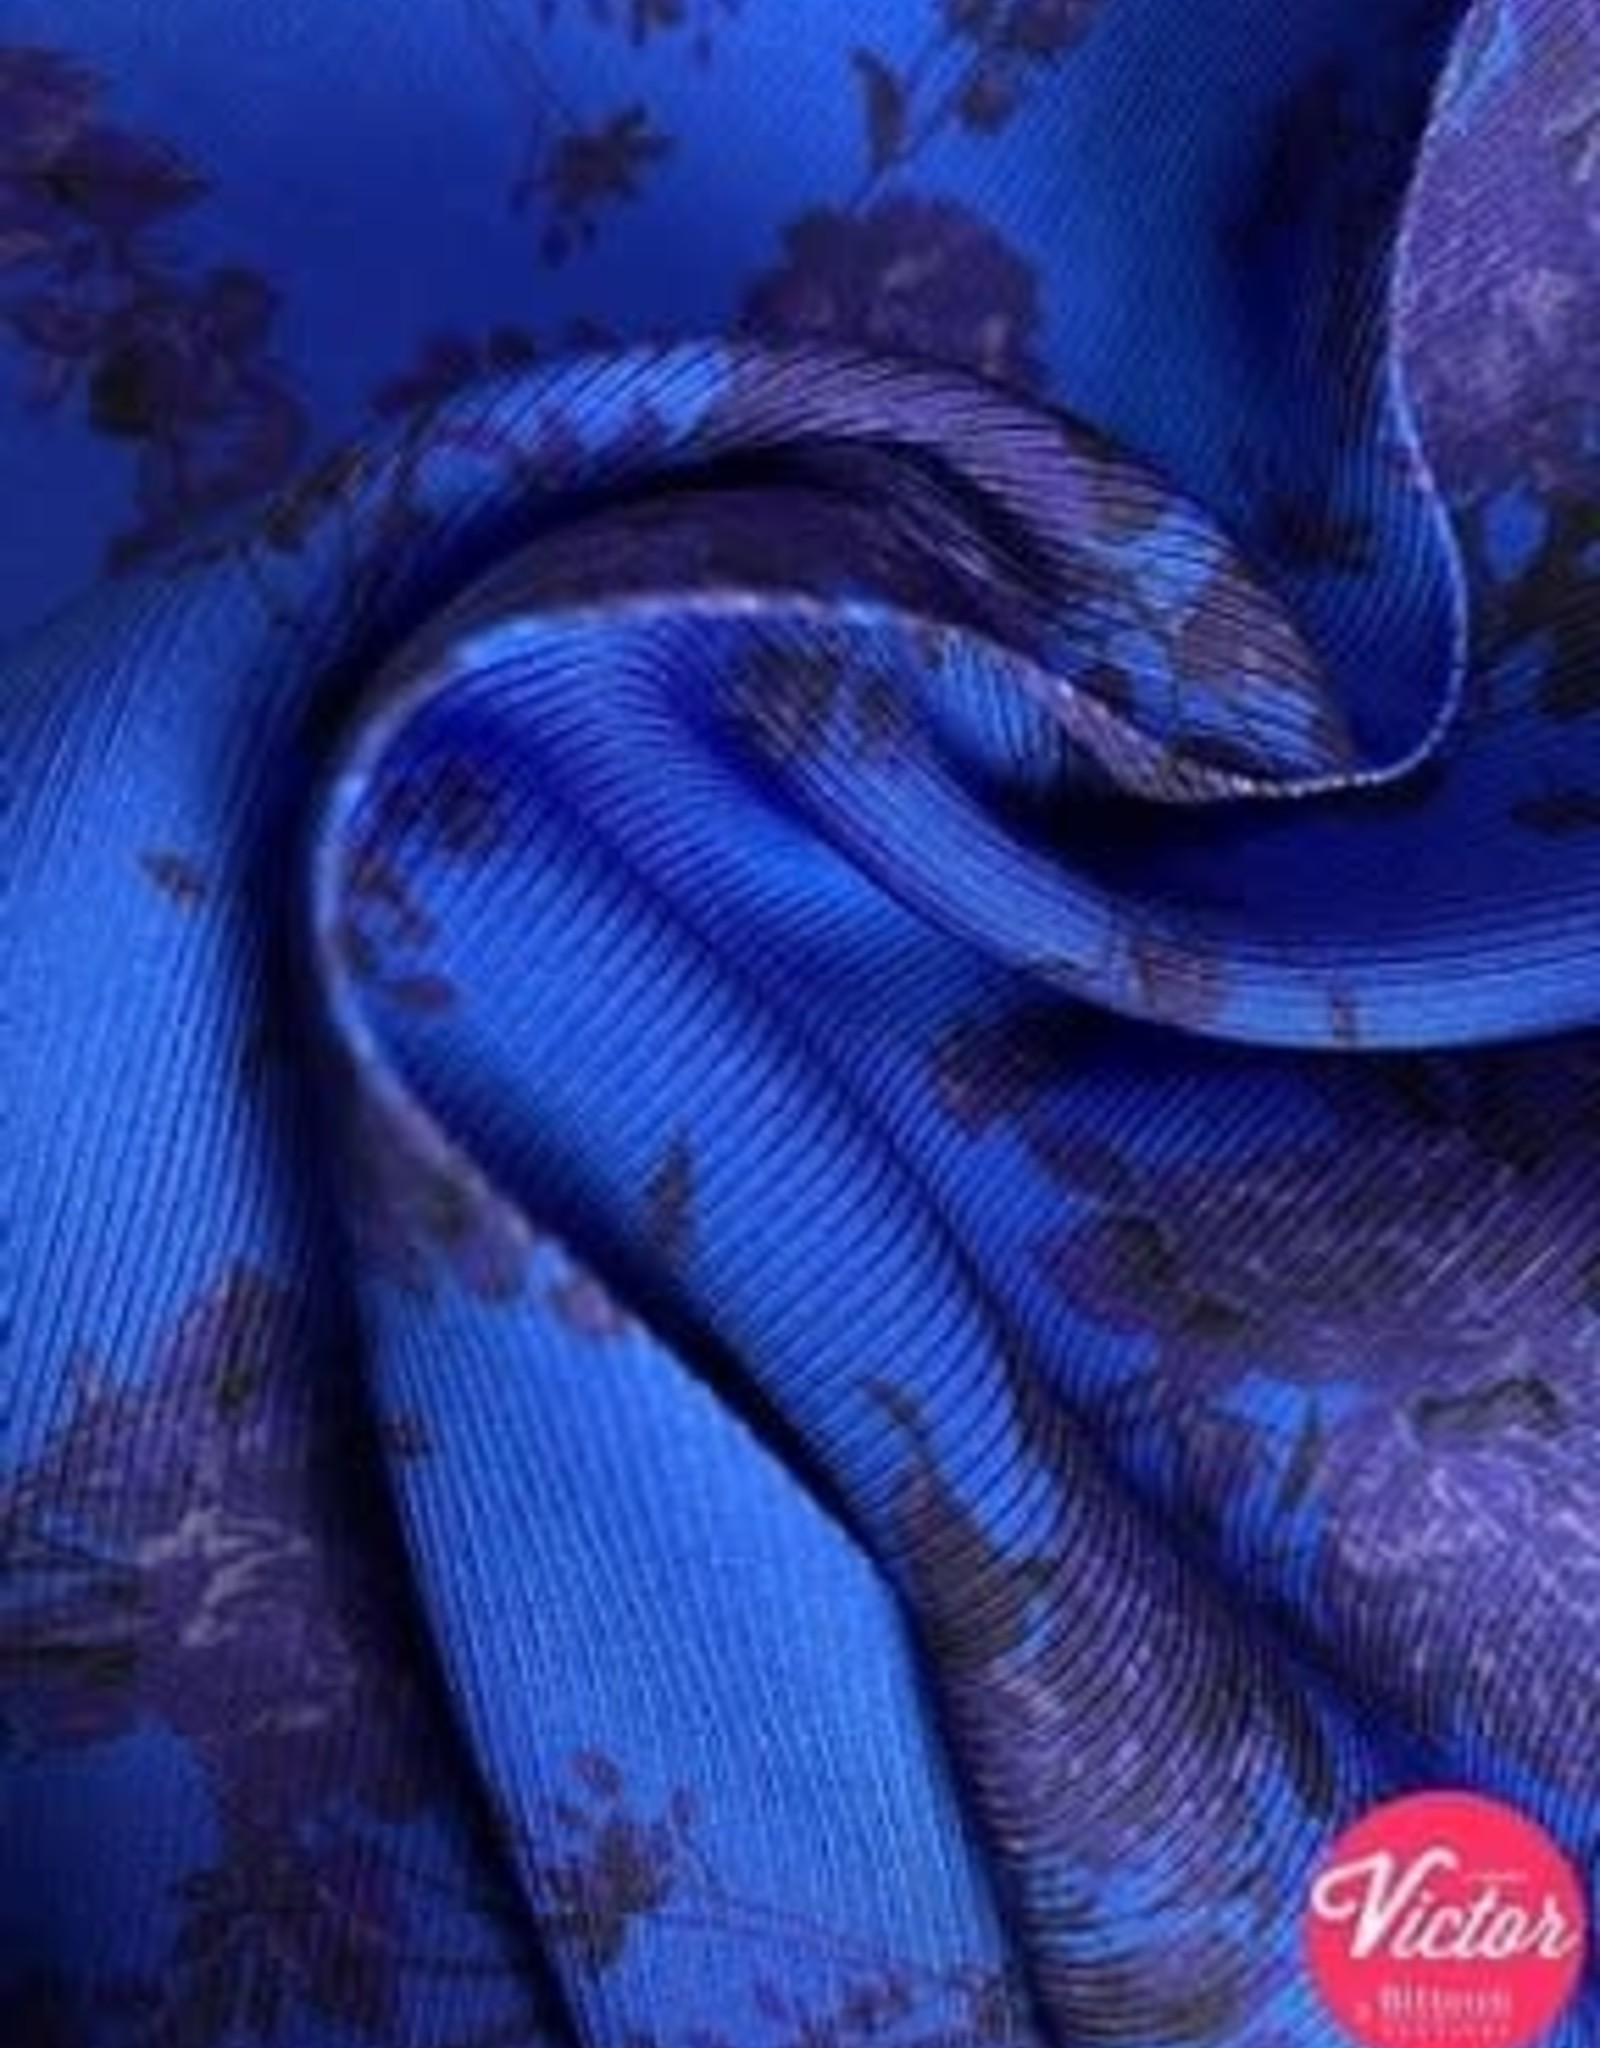 Bittoun Bittoun viscose  blauwe bloemen